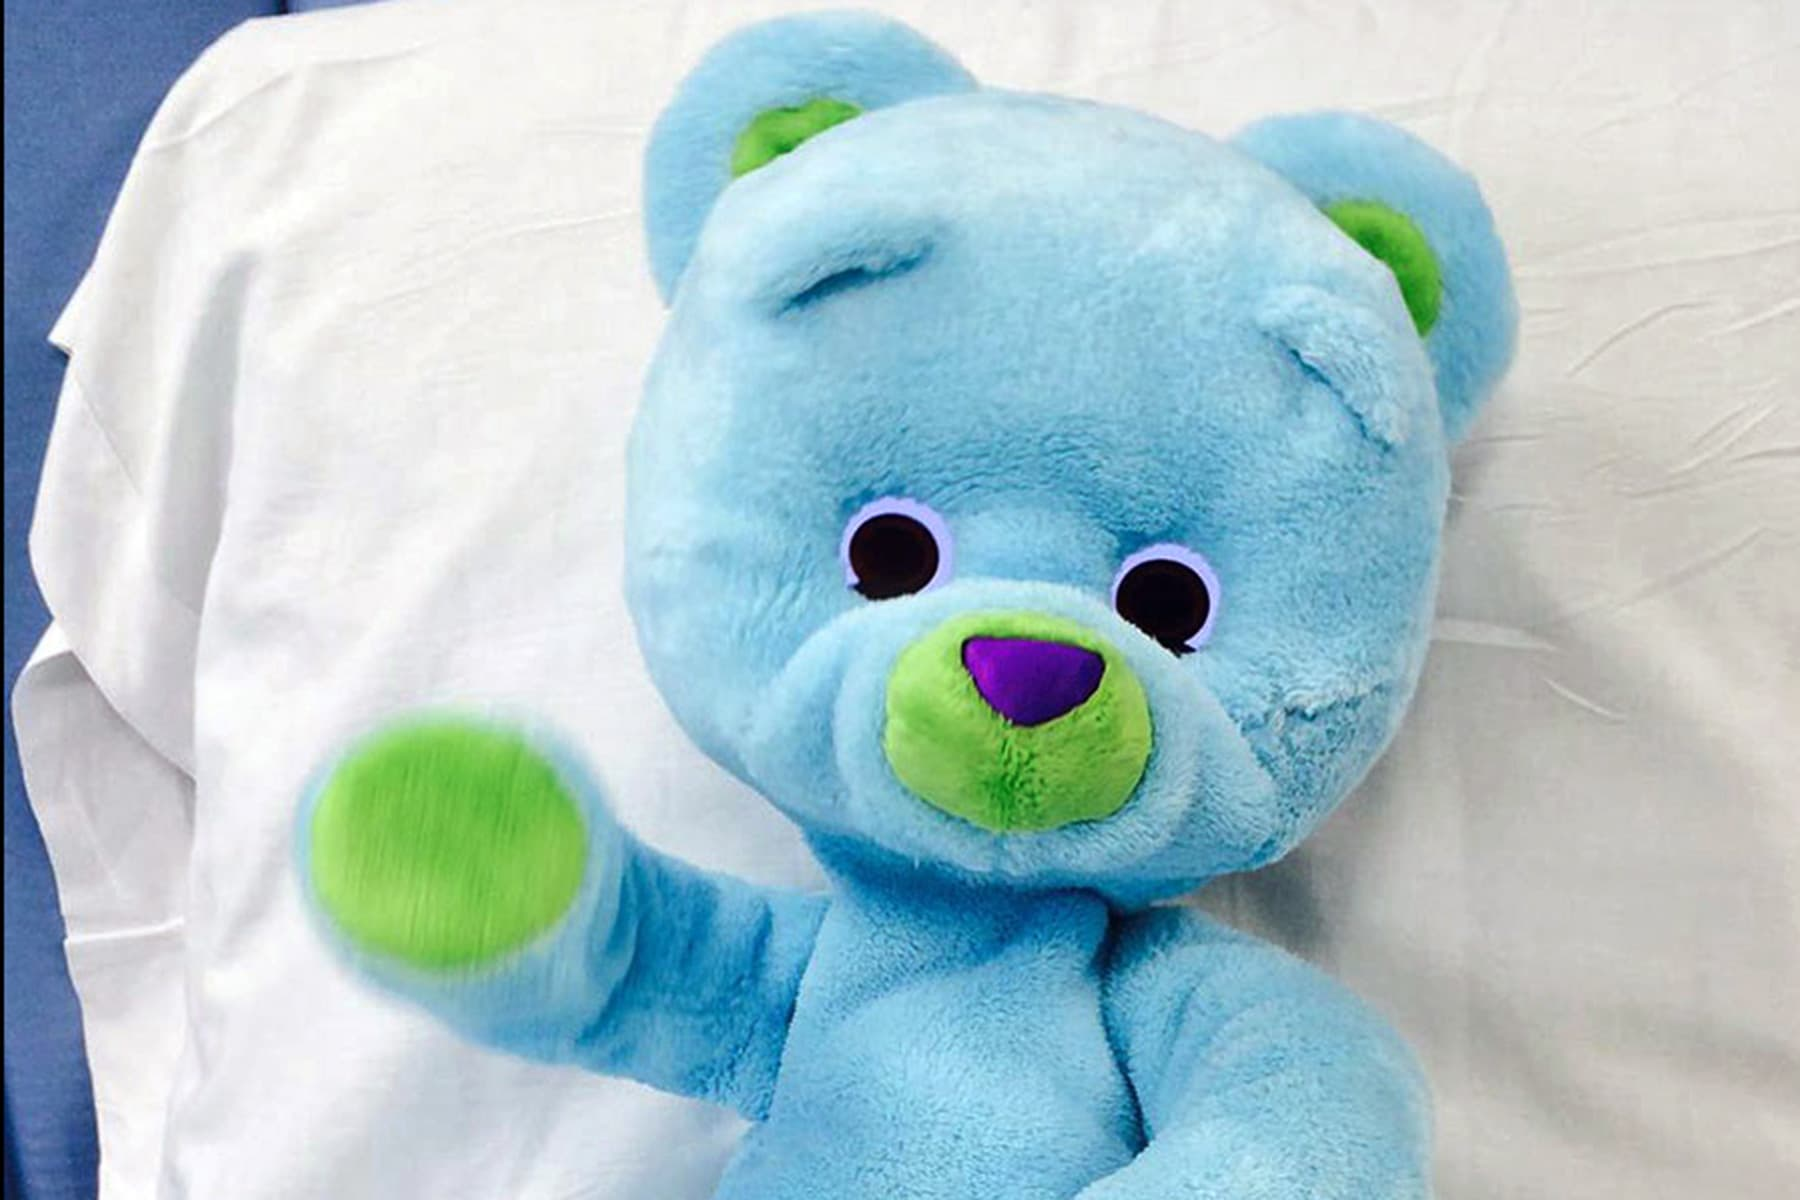 bear companion robot for sick children